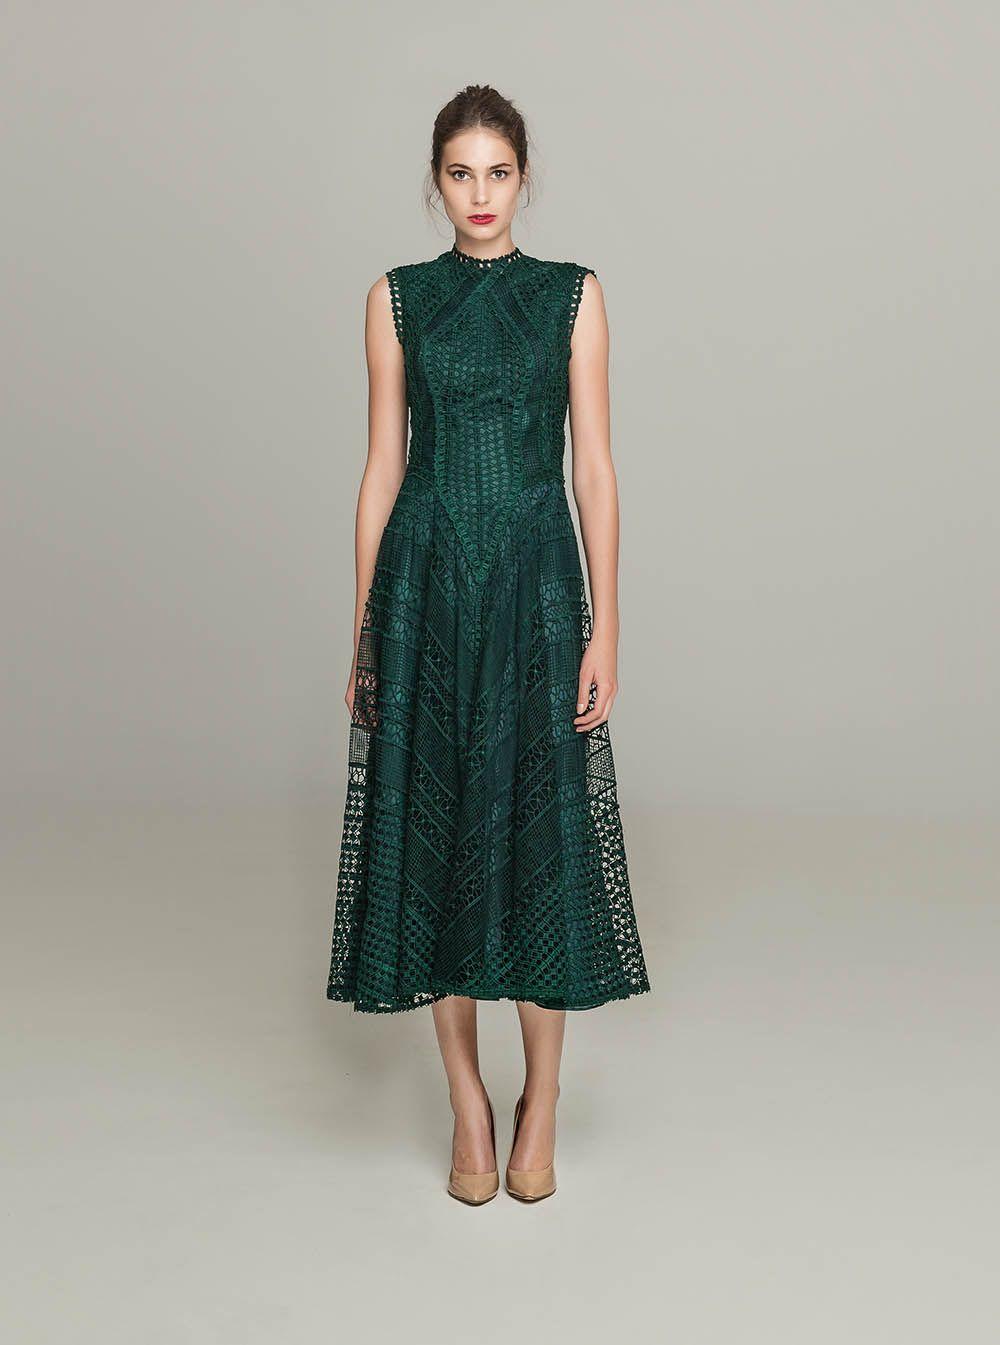 44da1952bf0f b>PR 1652 <br>Sleeveless Guipure Lace Open Back Midi Dress, Deep ...